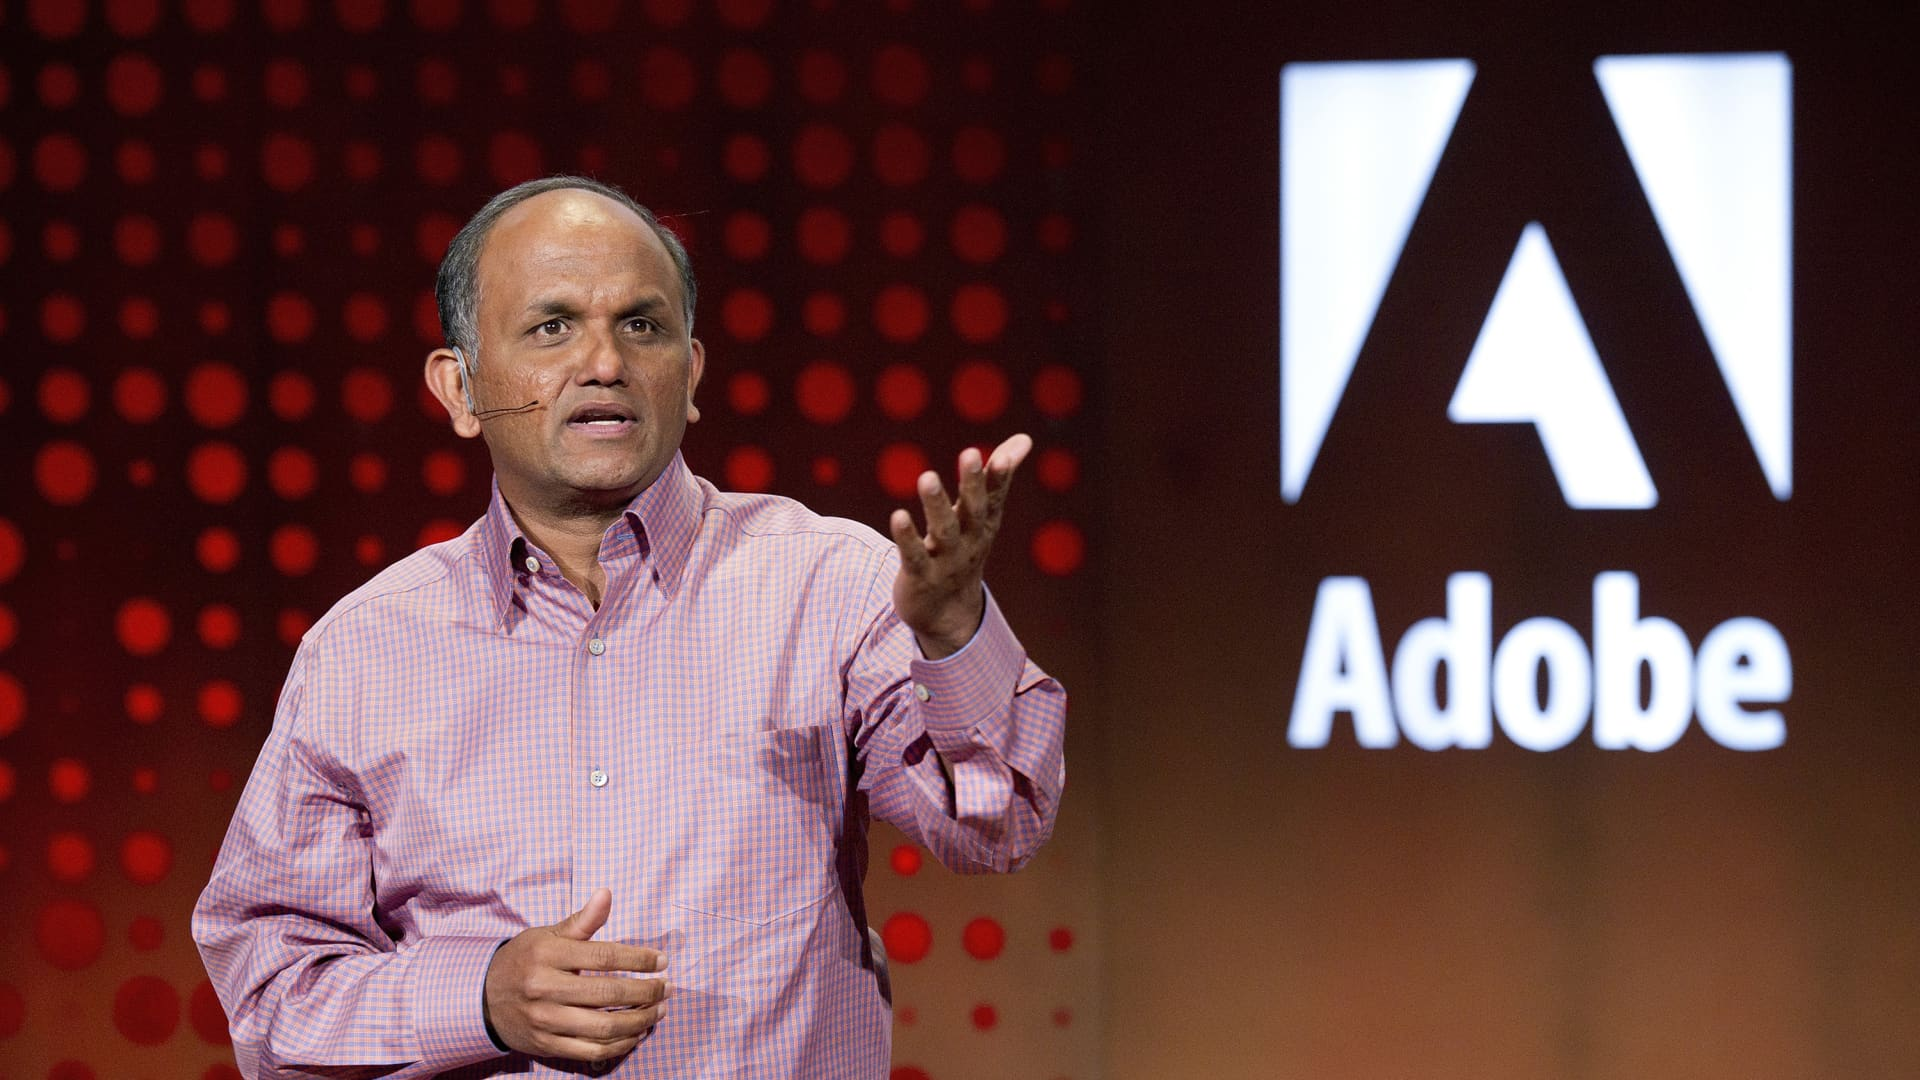 Shantanu Narayen, president and chief executive officer of Adobe Systems